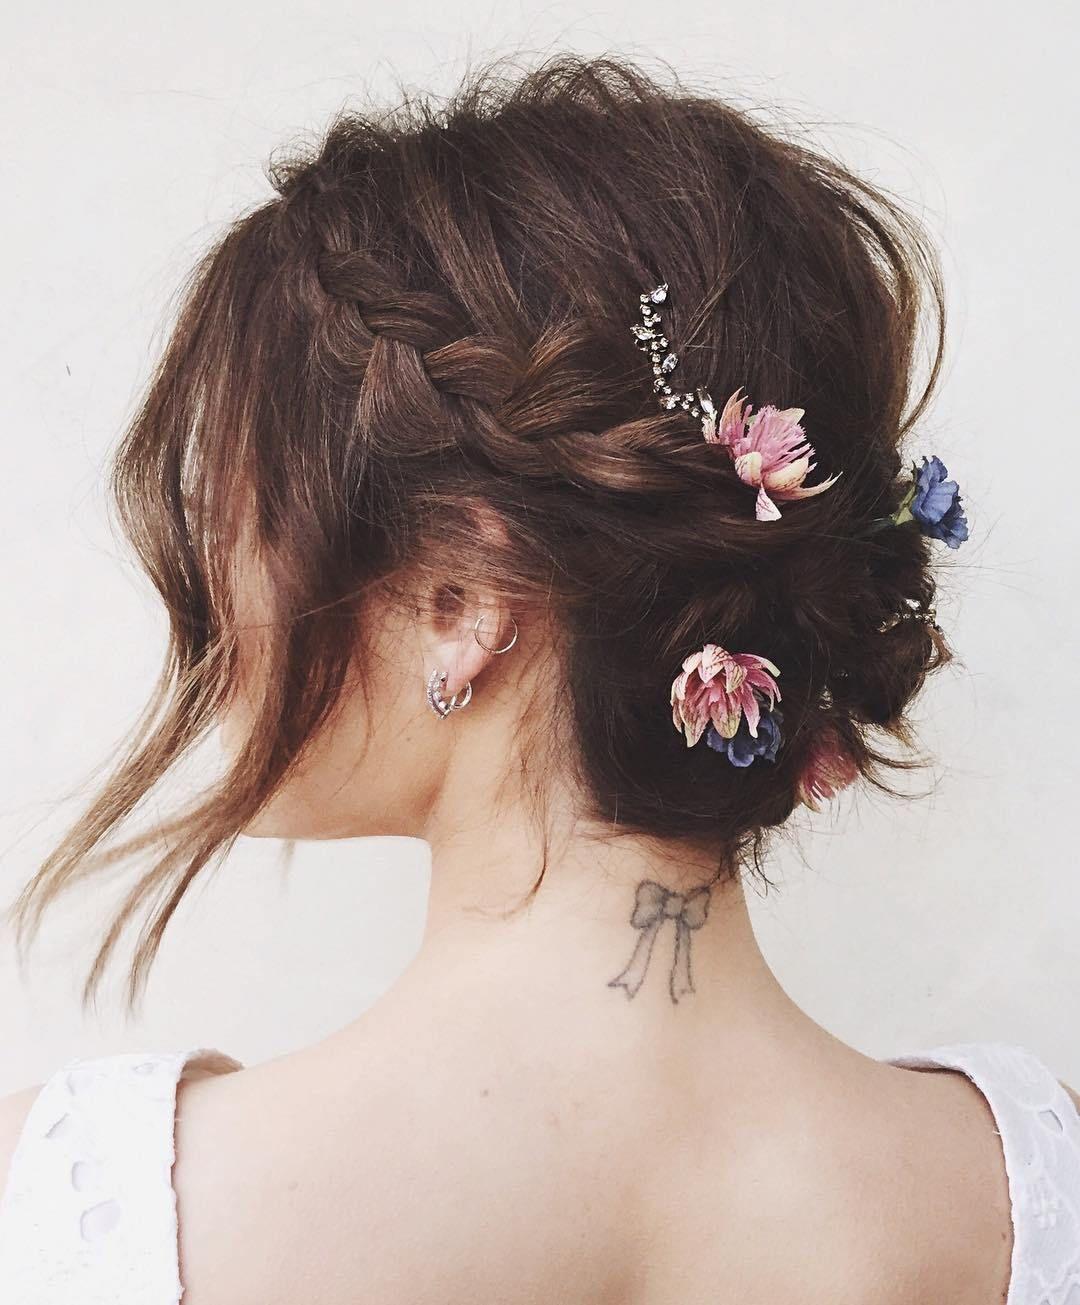 50+ best wedding hairstyles for short hair - wedding hairstyles  - cuteweddingideas.com